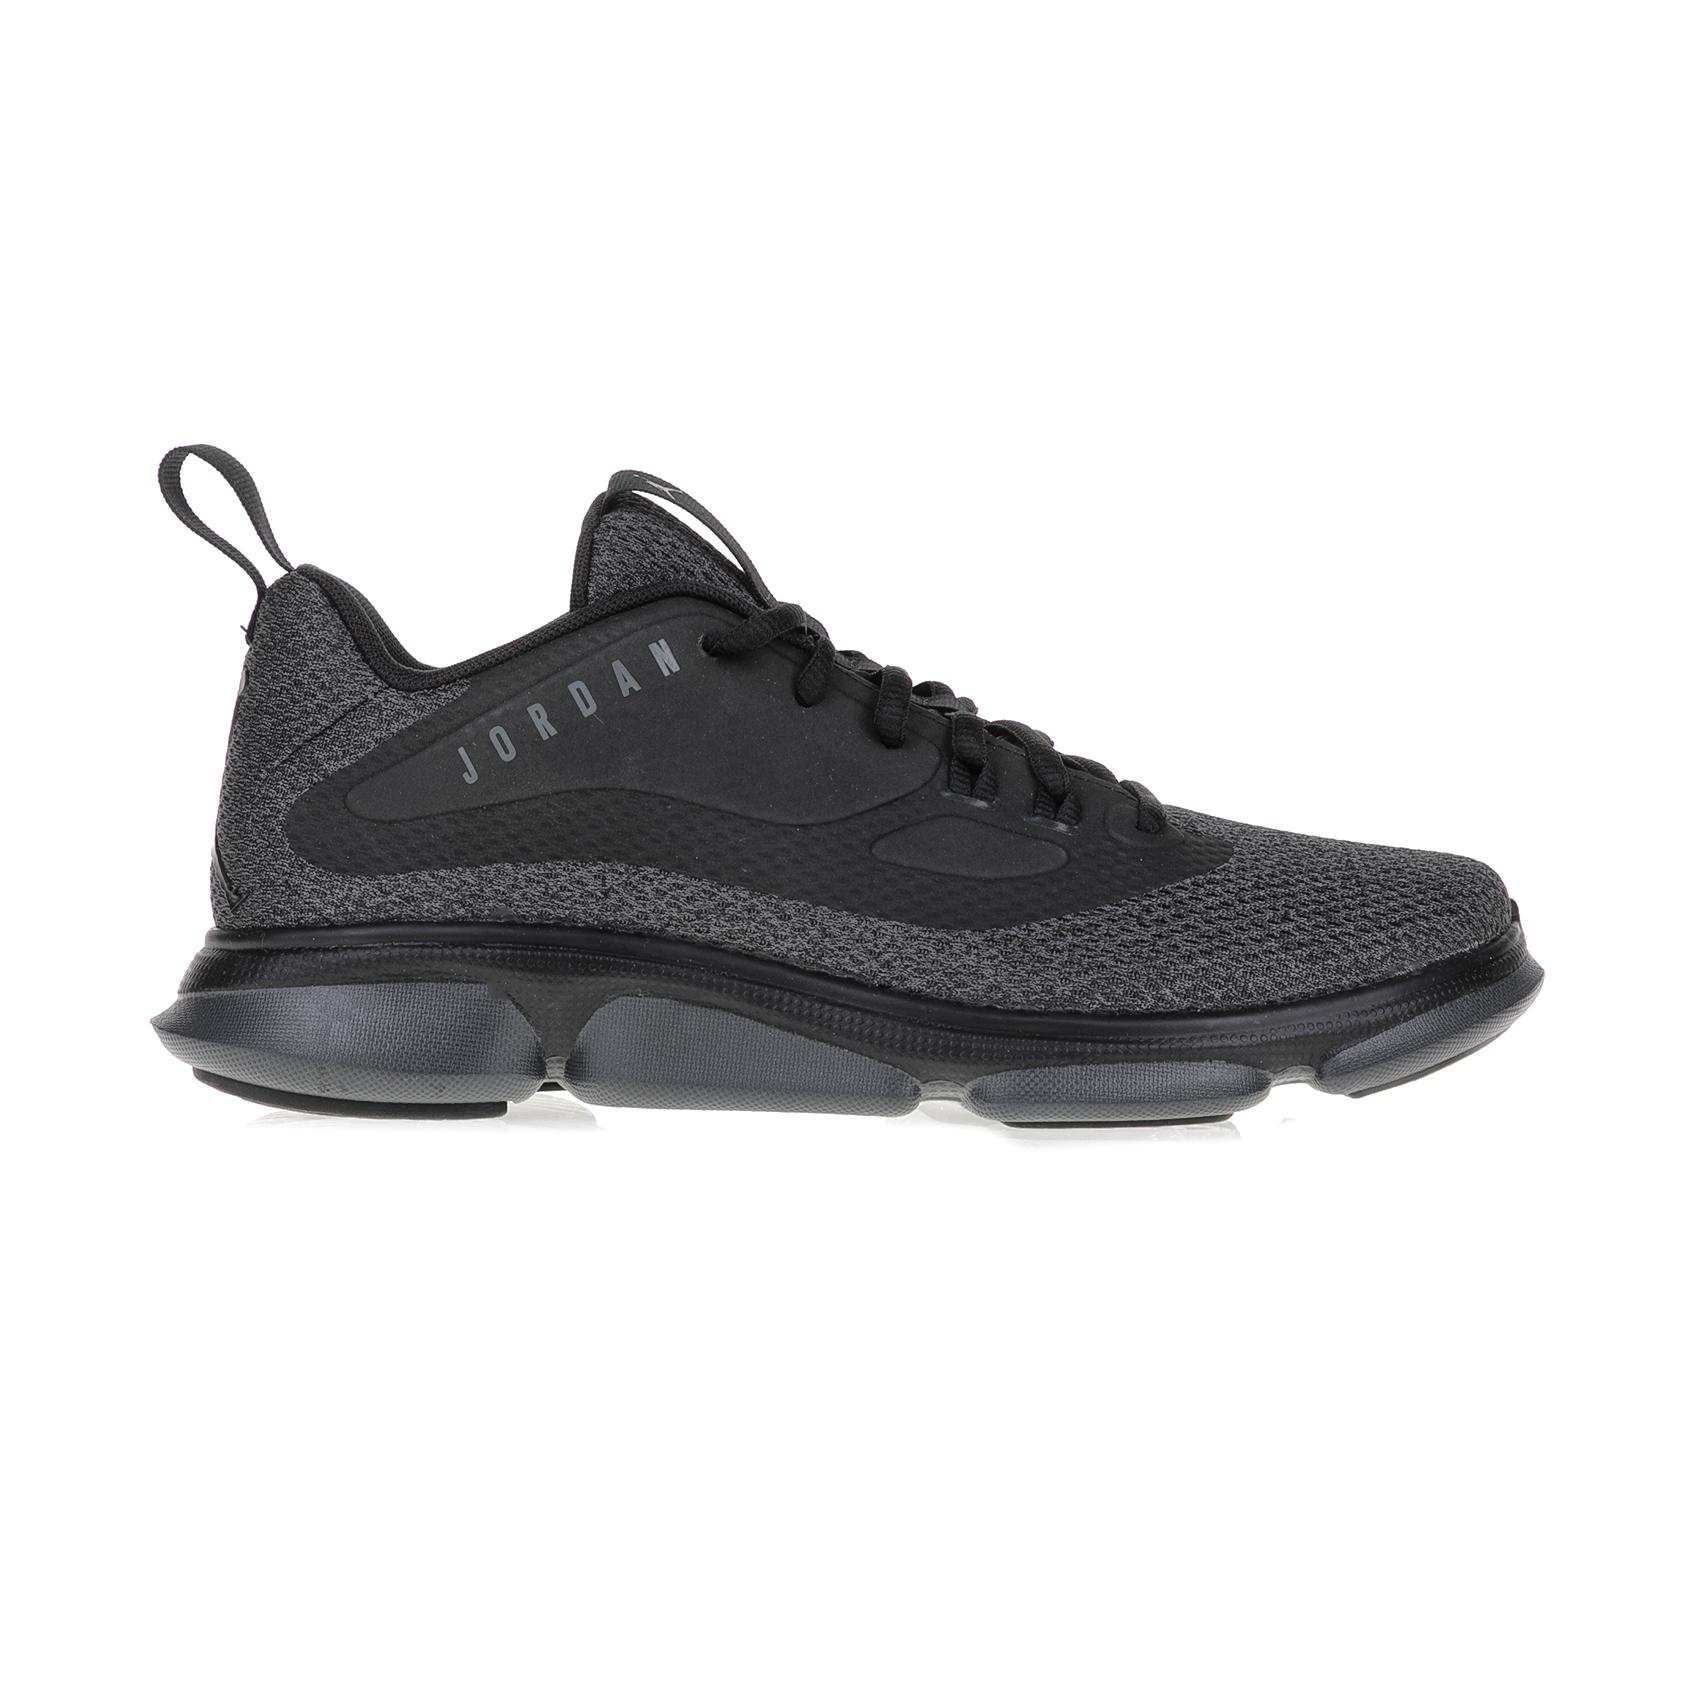 NIKE – Ανδρικά αθλητικά παπούτσια ΝΙΚΕ JORDAN IMPACT TR μαύρα